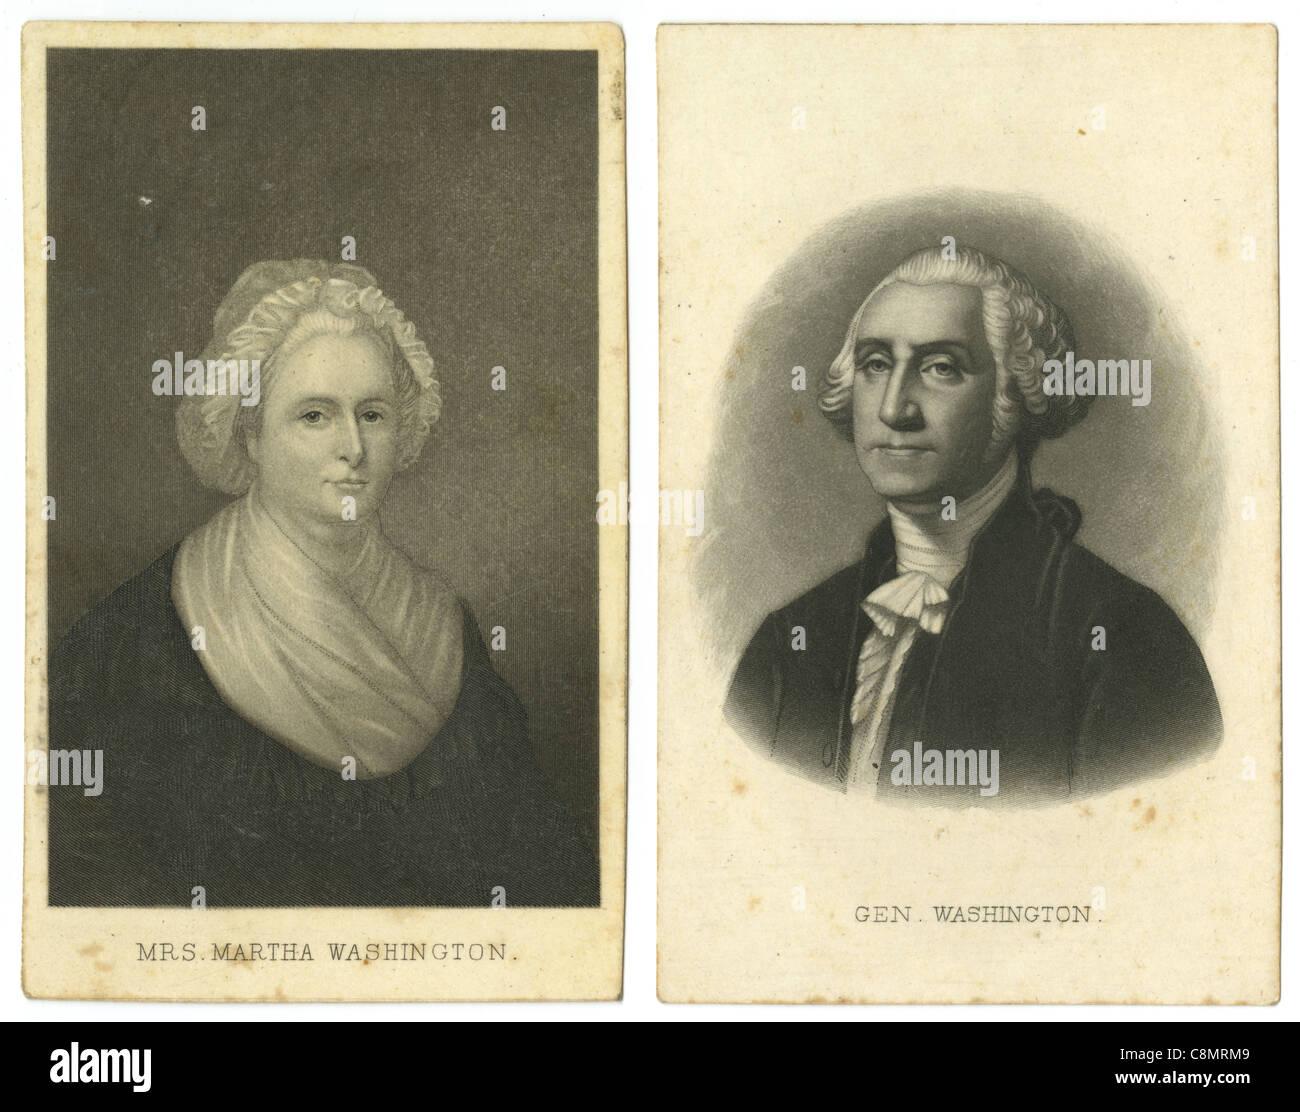 Carte De Visite Style Cards For Martha And George Washington